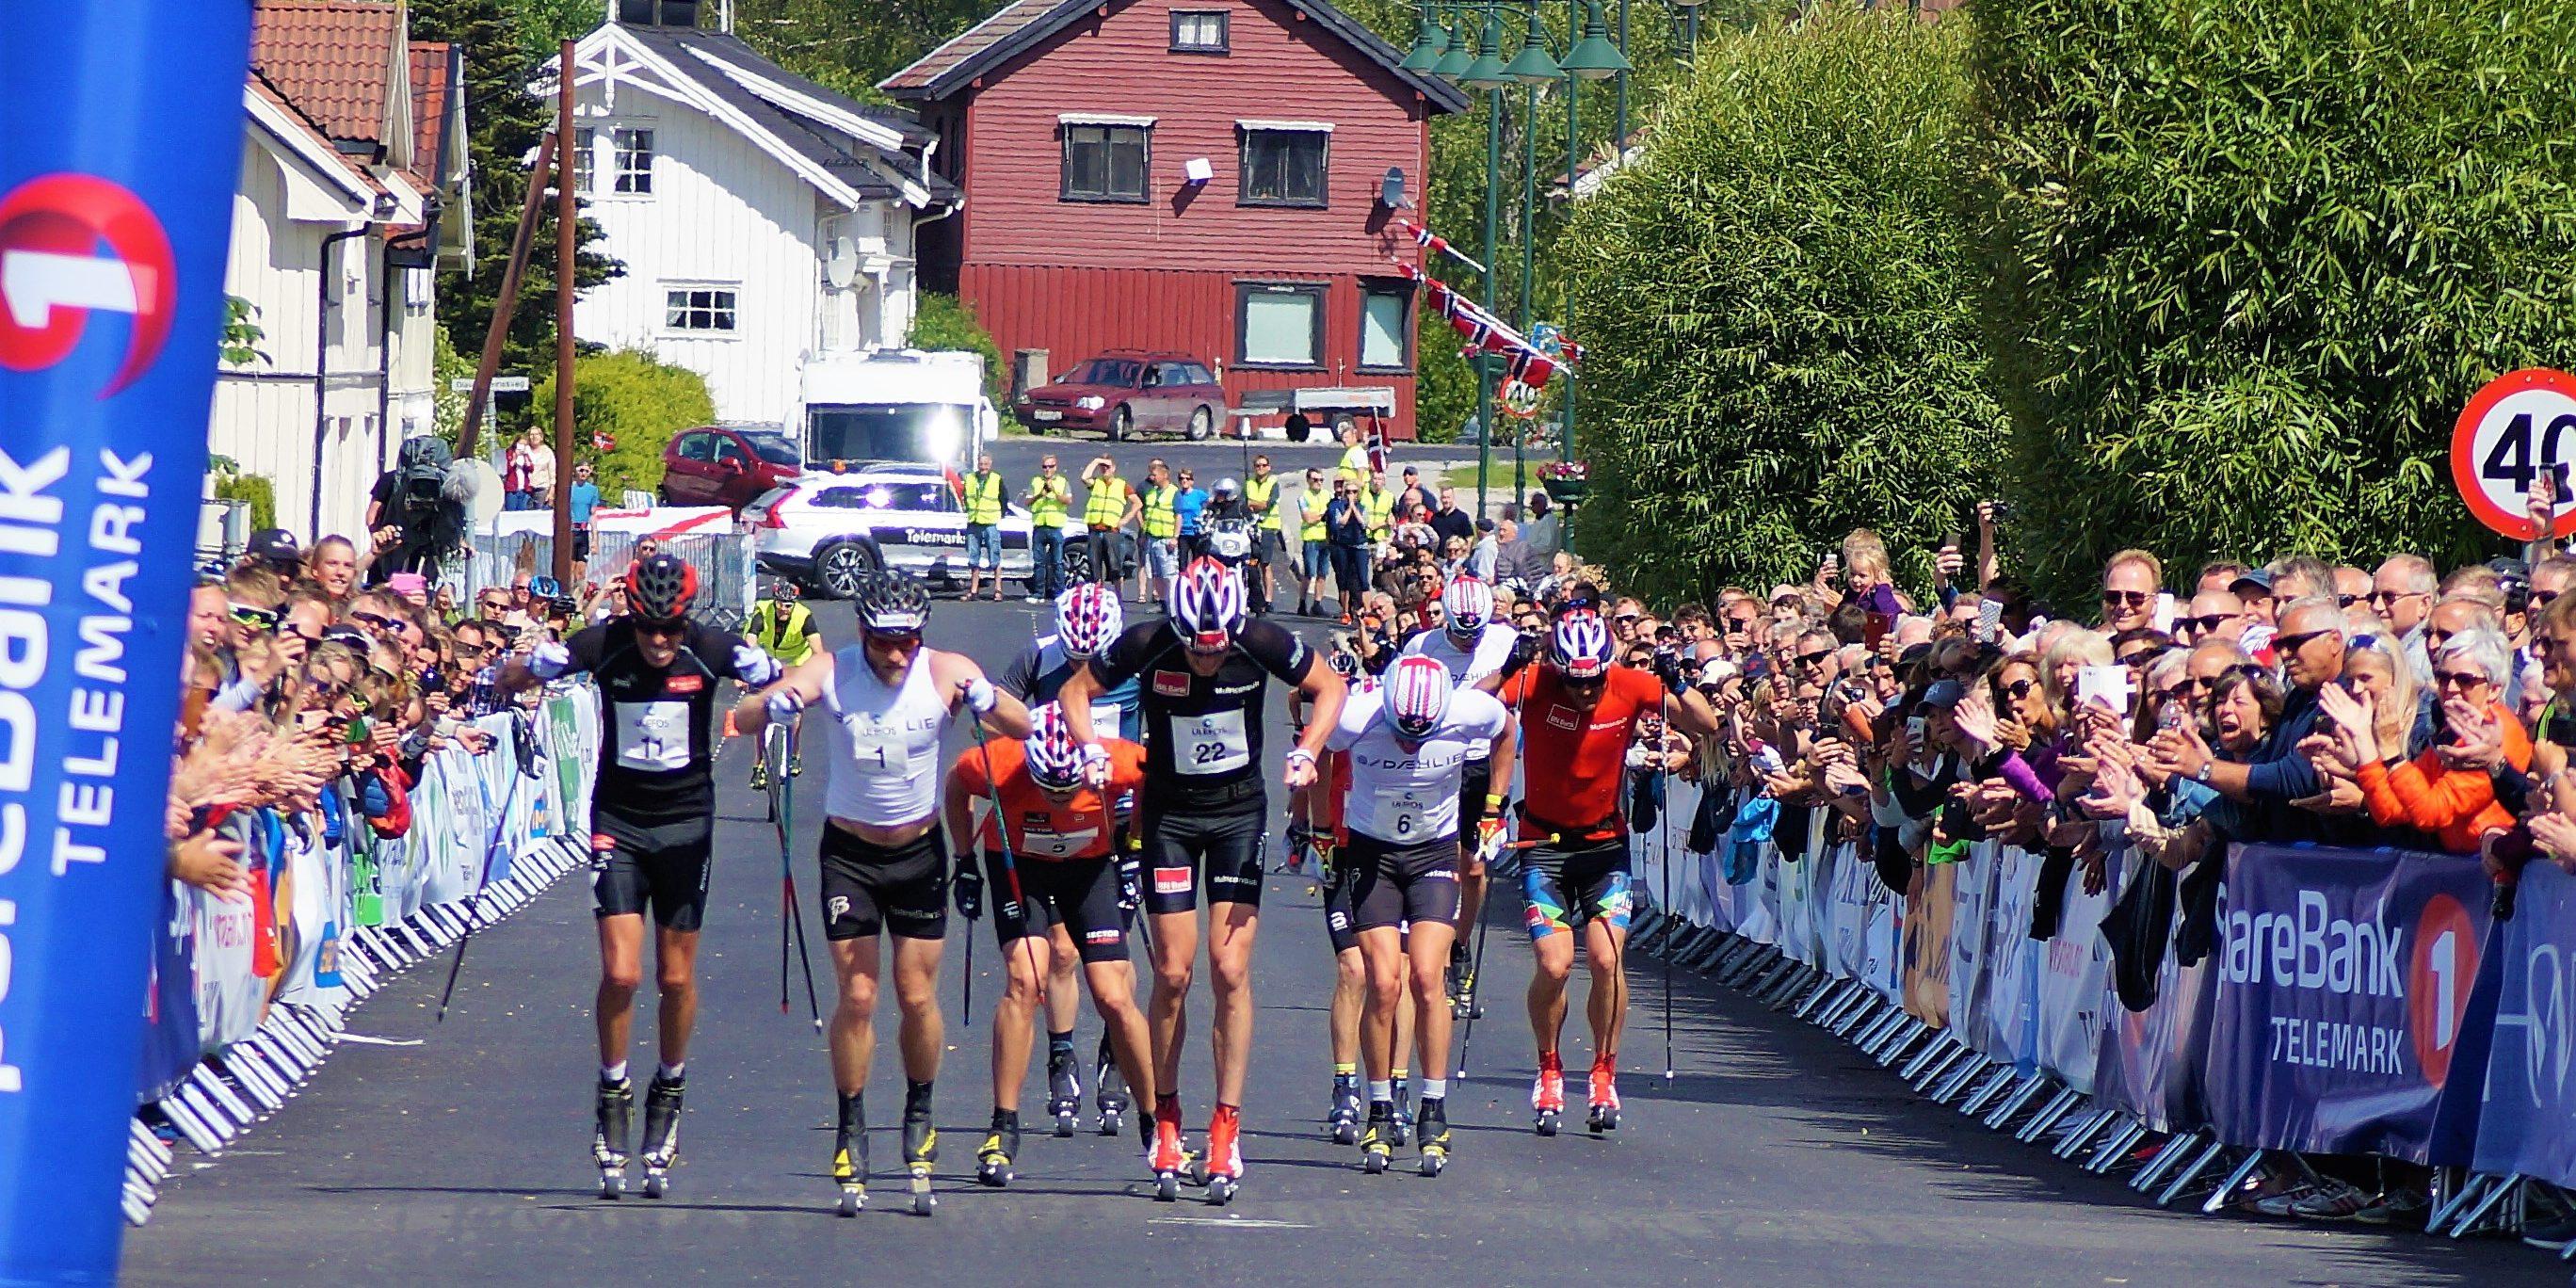 Sommarland Skifestival